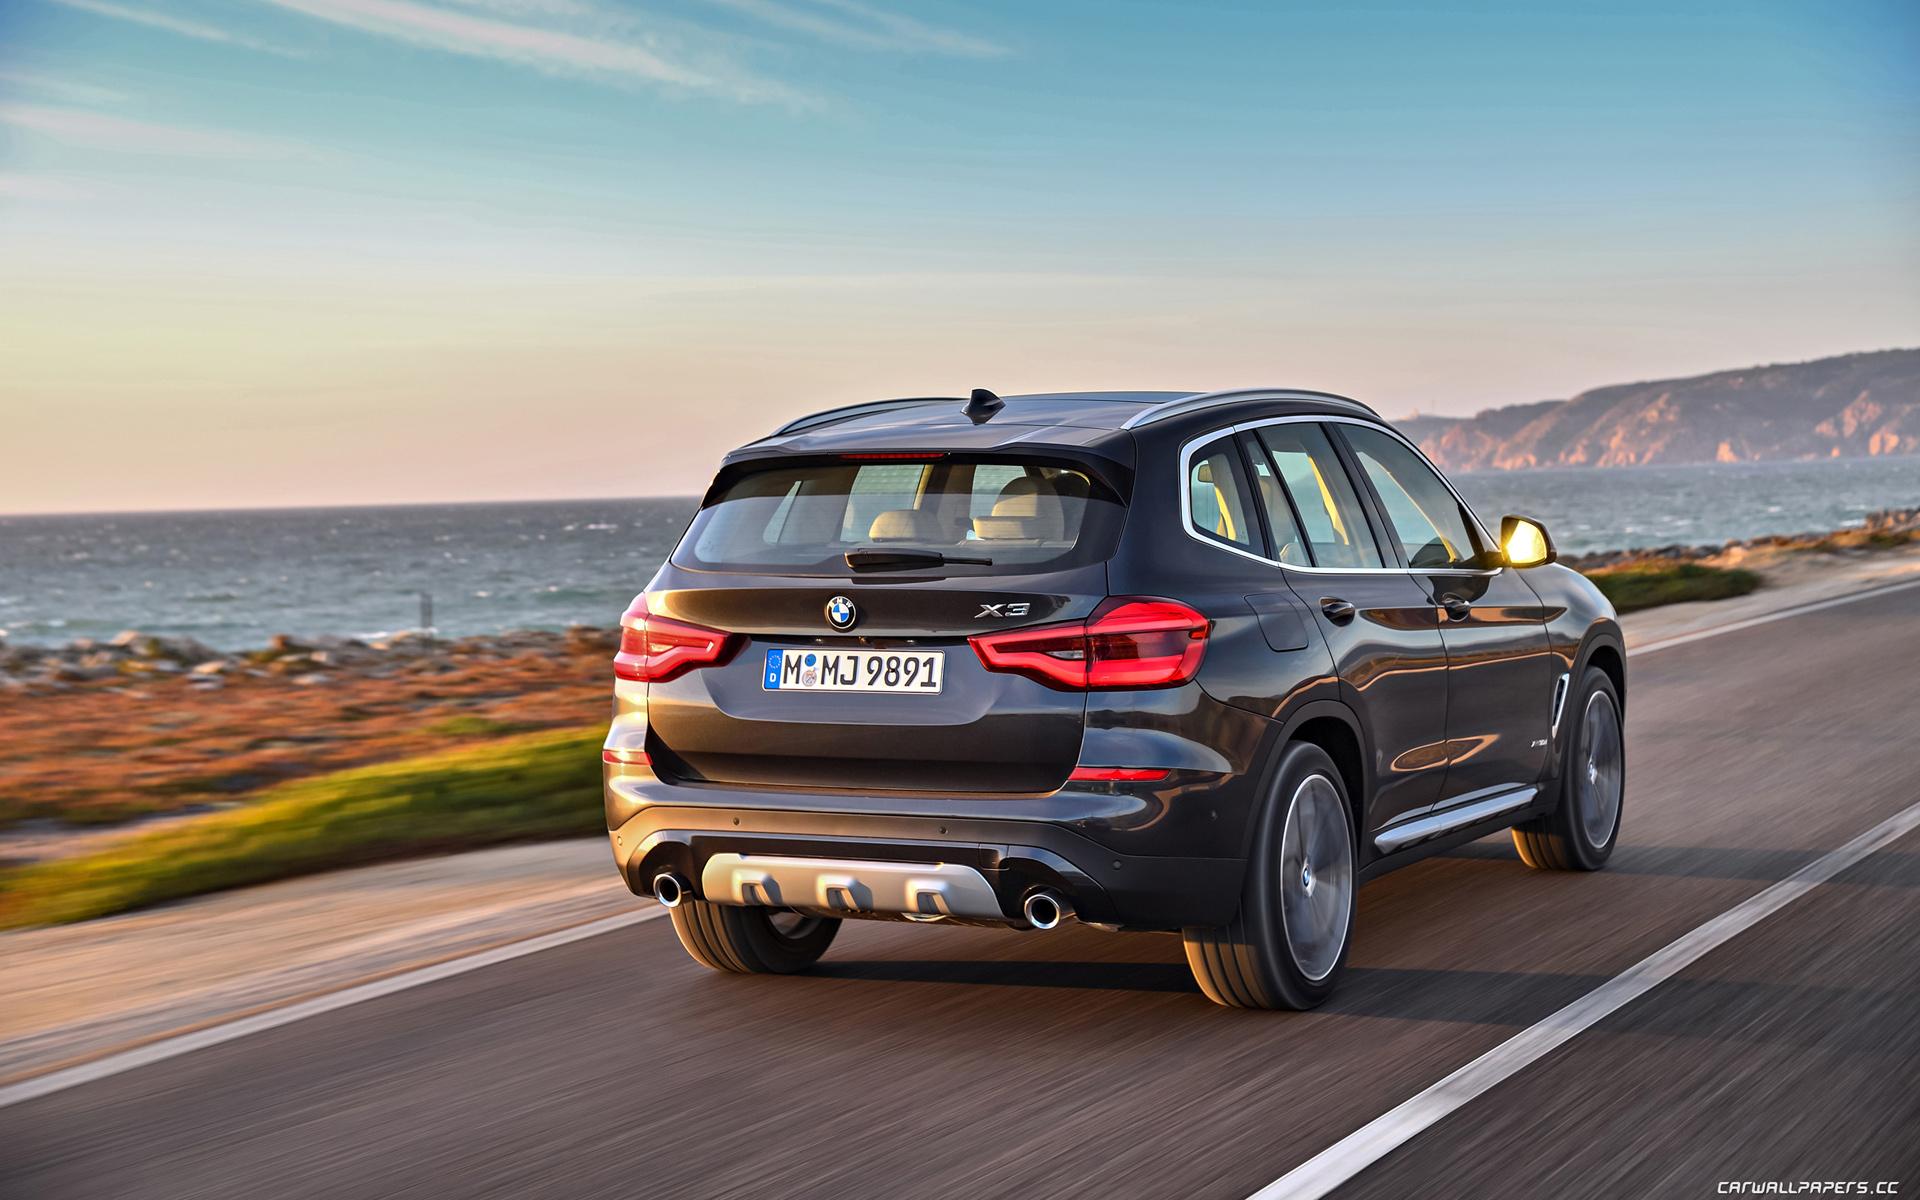 Cars desktop wallpapers BMW X3 xDrive30d xLine - 2018 - Page 2